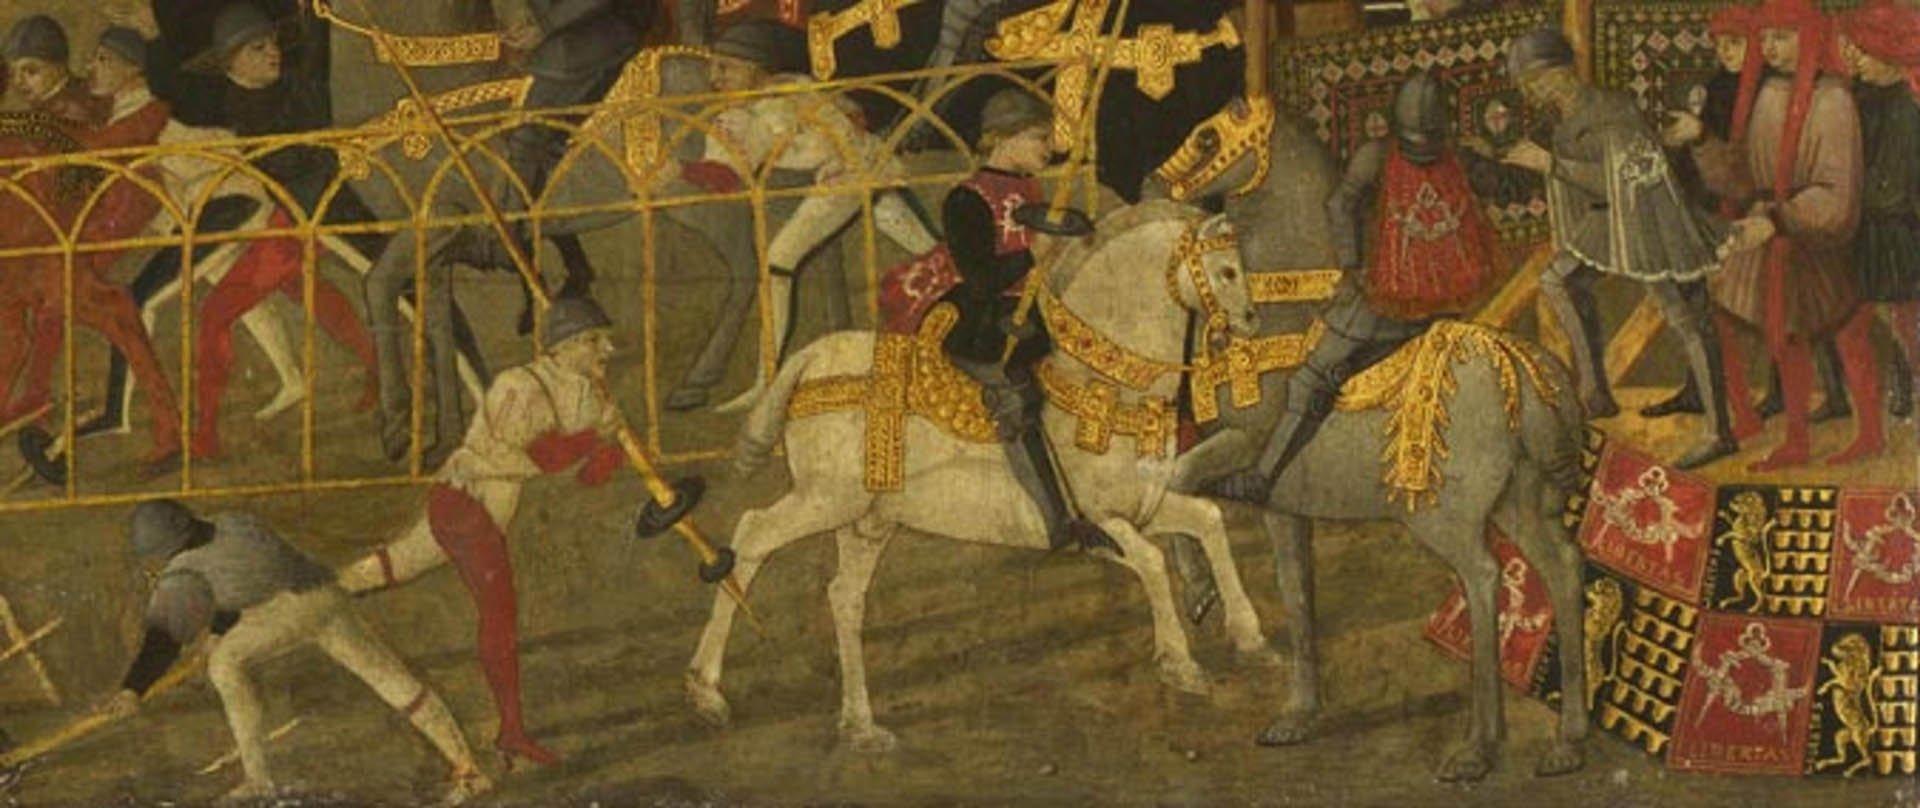 Renaissance Art Wallpaper - WallpaperSafari